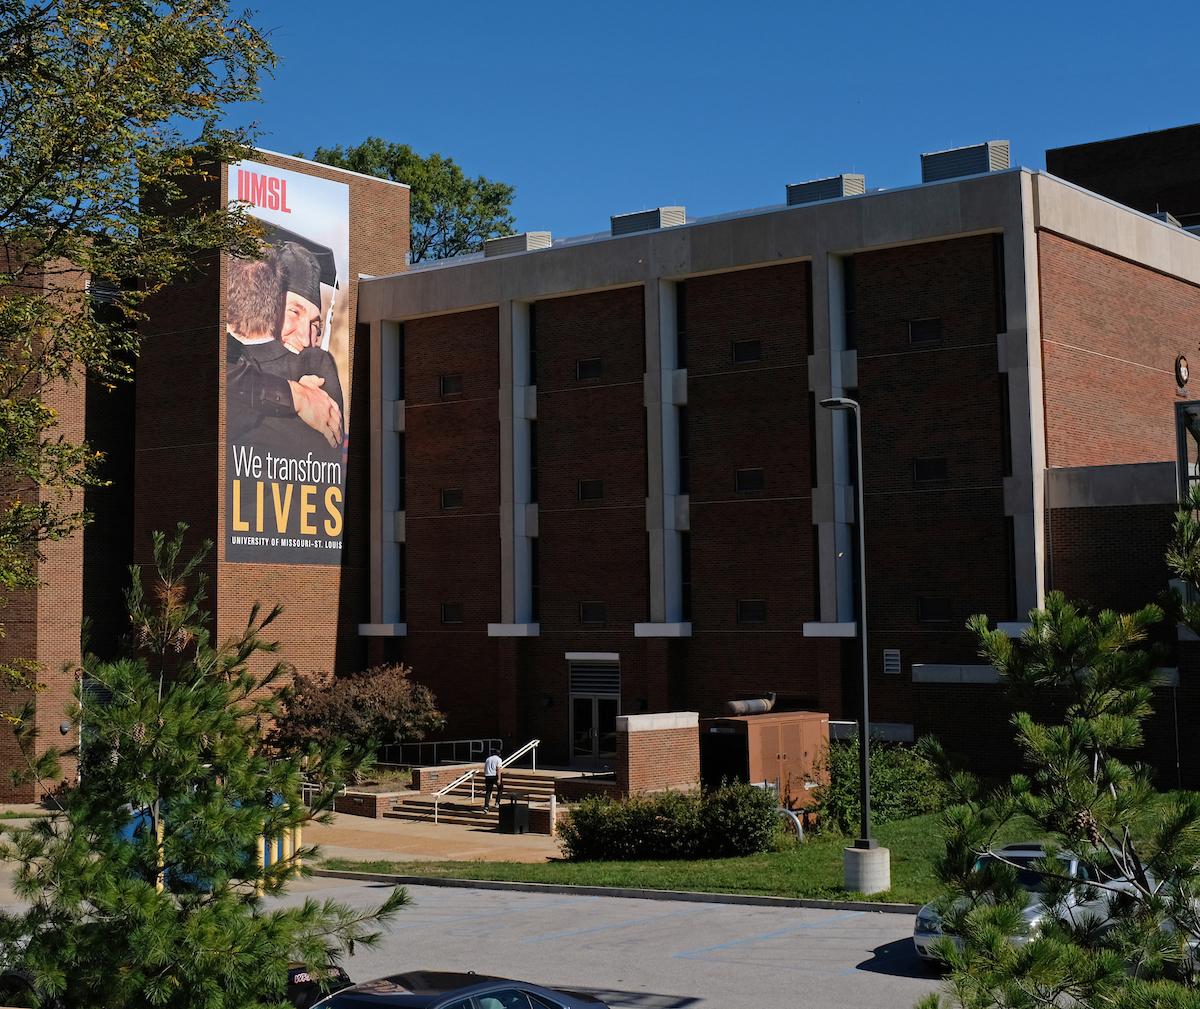 Benton Hall exterior